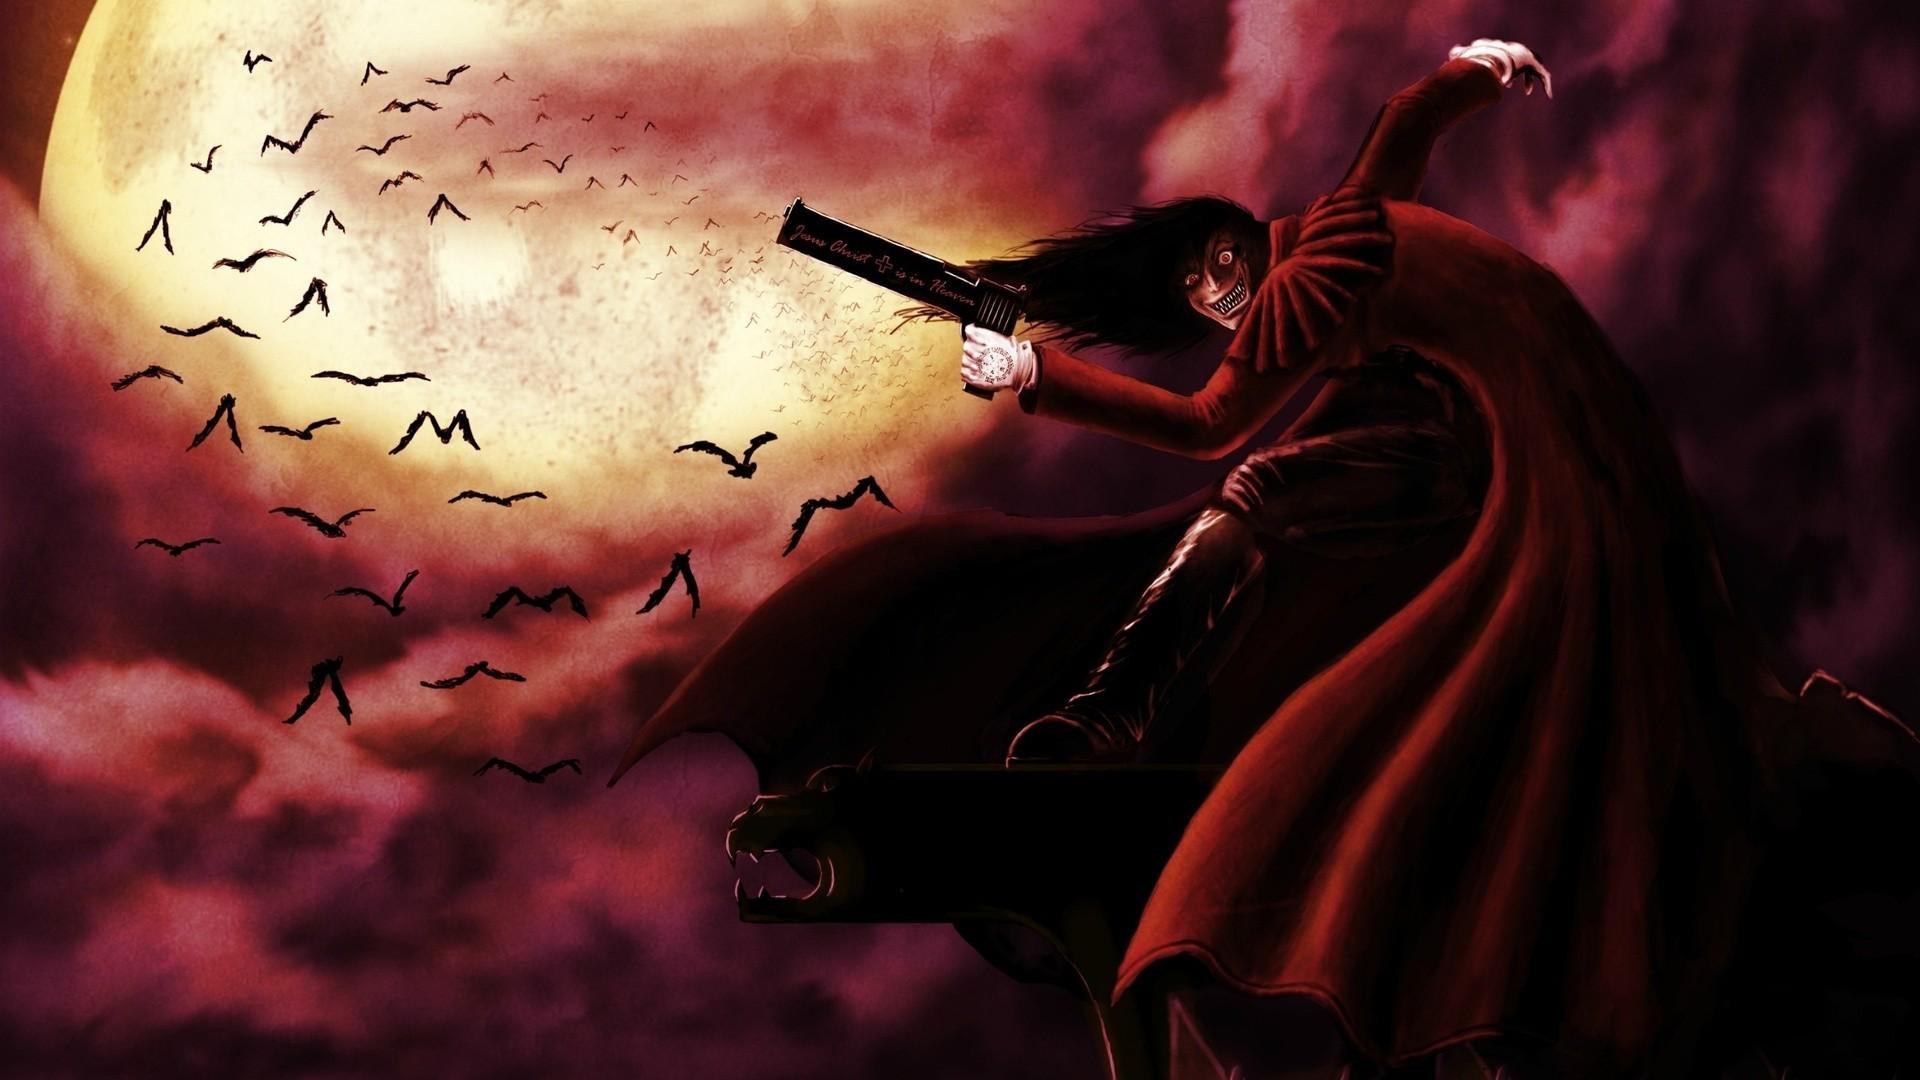 Res: 1920x1080, Alucard, Vampire, Hellsing, Demon, Alucard, Anime, Hellsing An